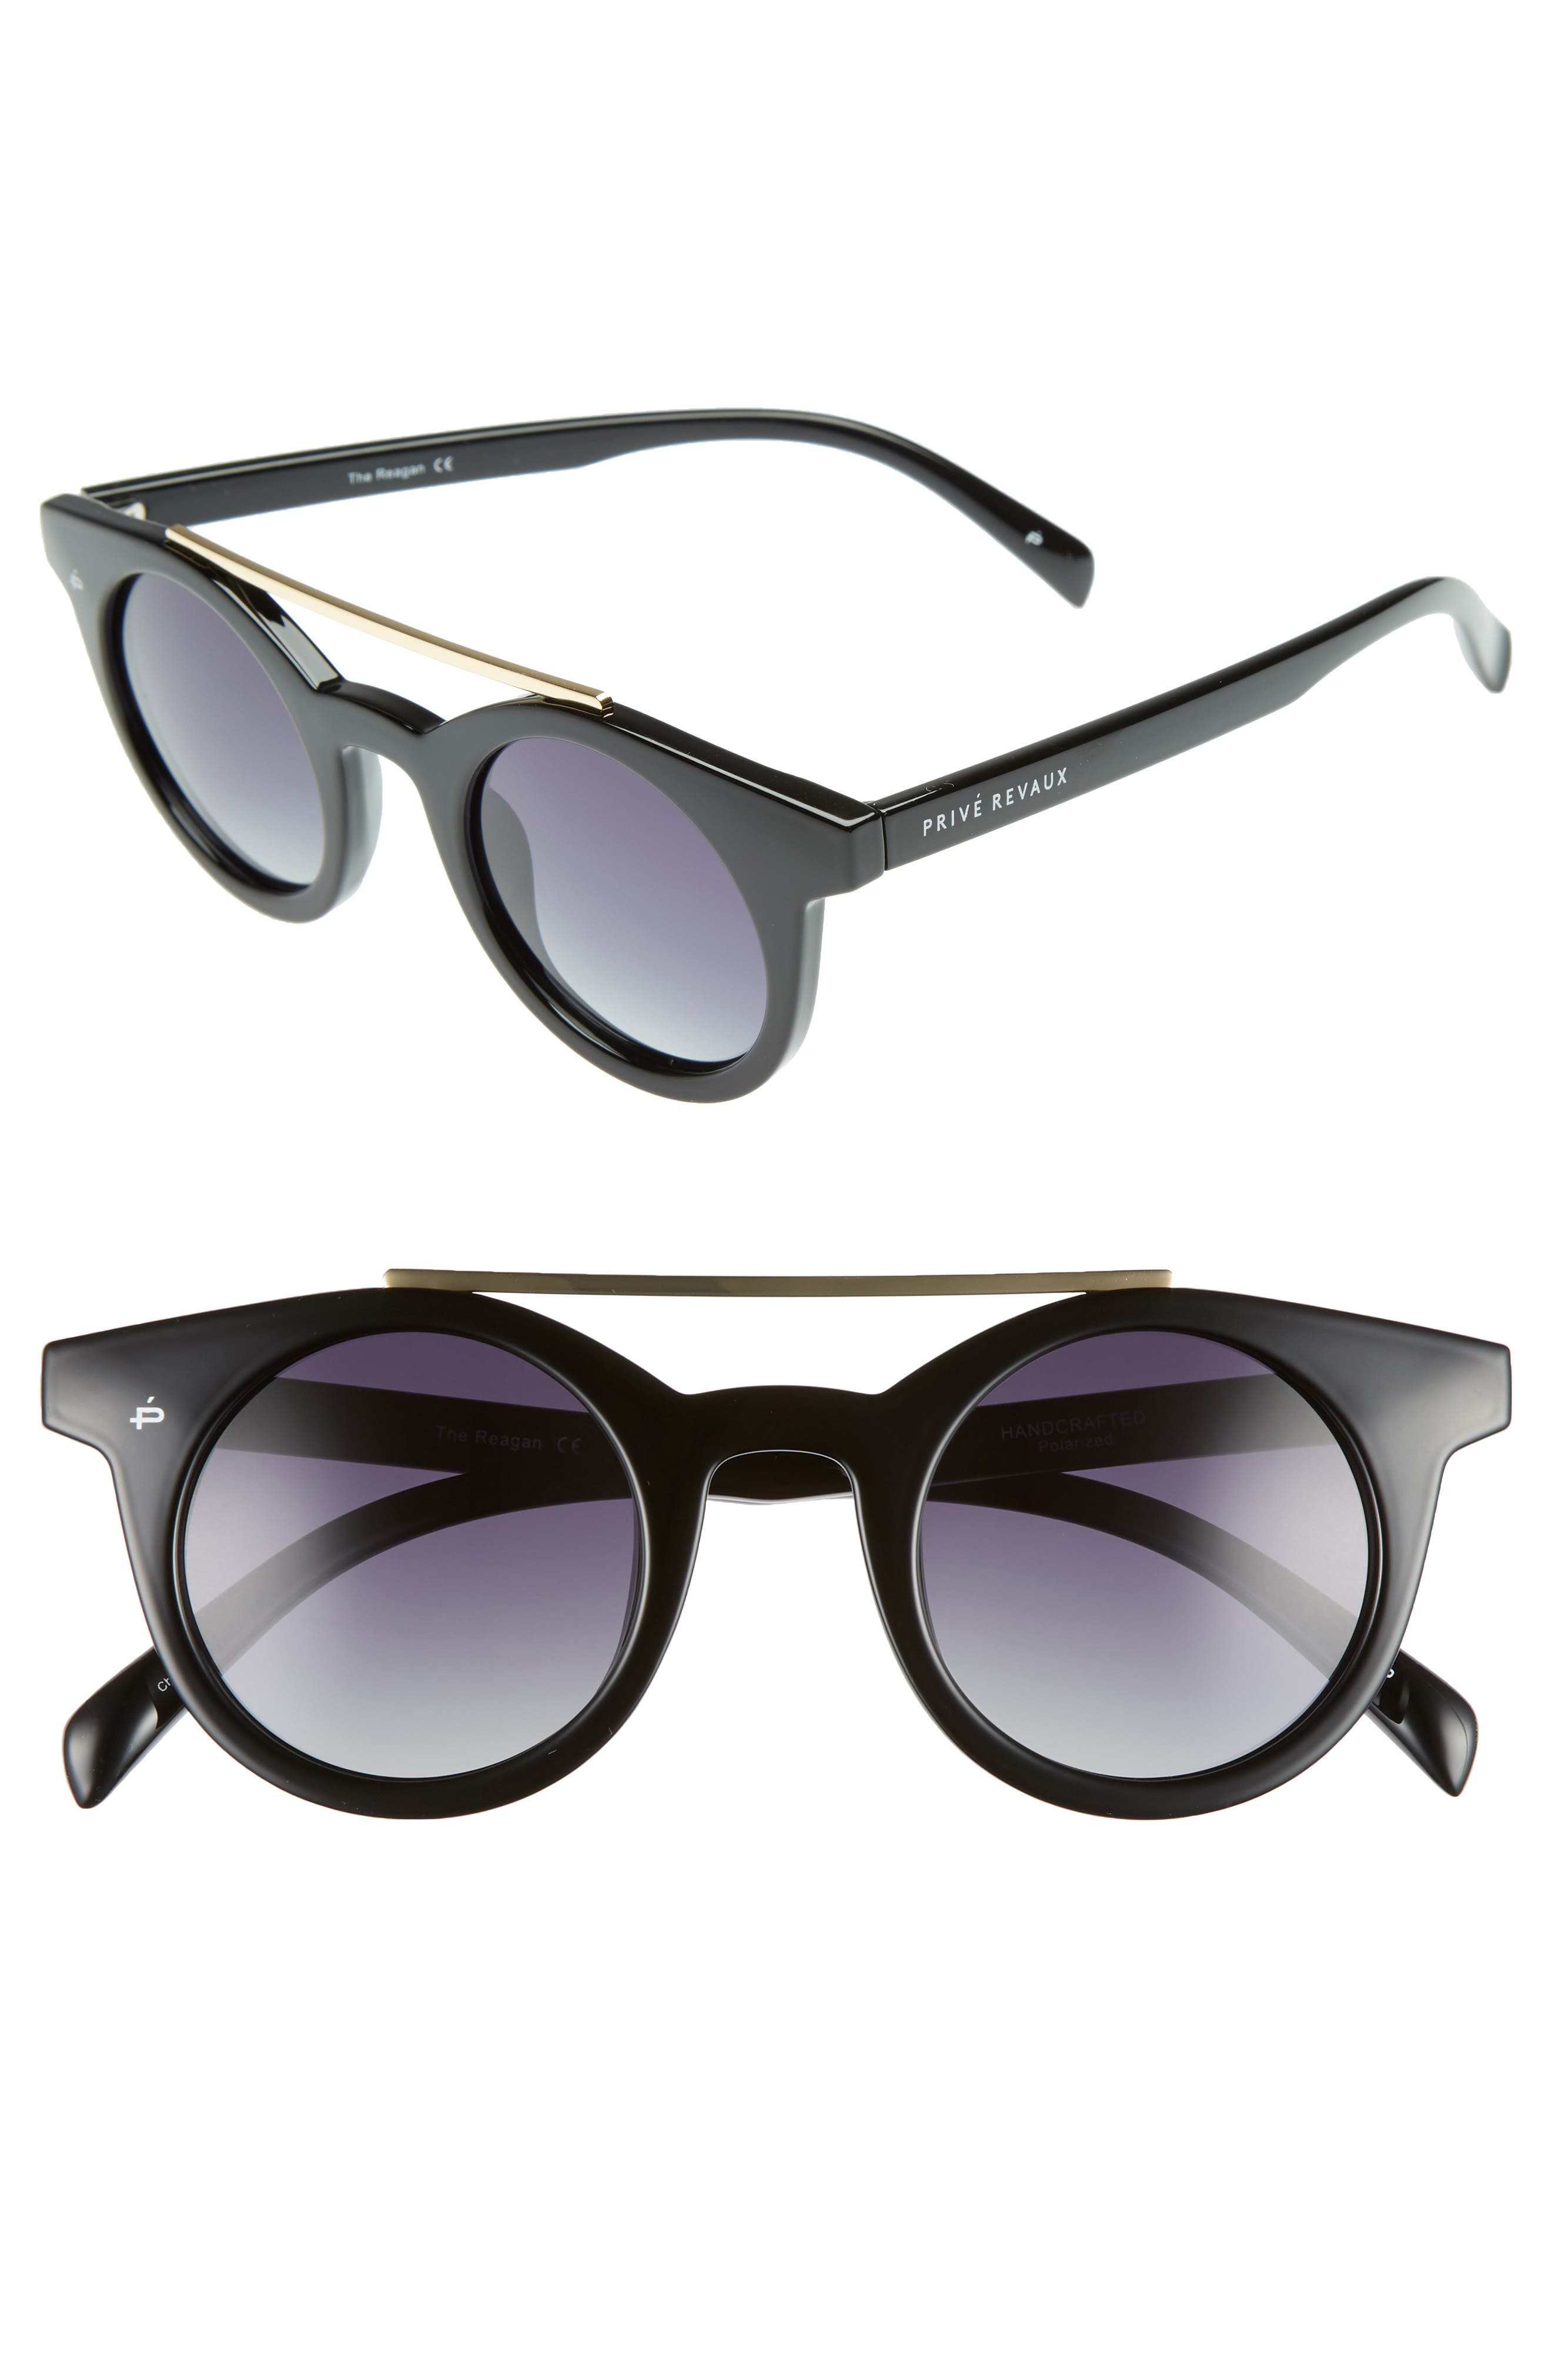 Alternate Image 1 Selected - Privé Revaux The Reagan 43mm Polarized Round Sunglasses